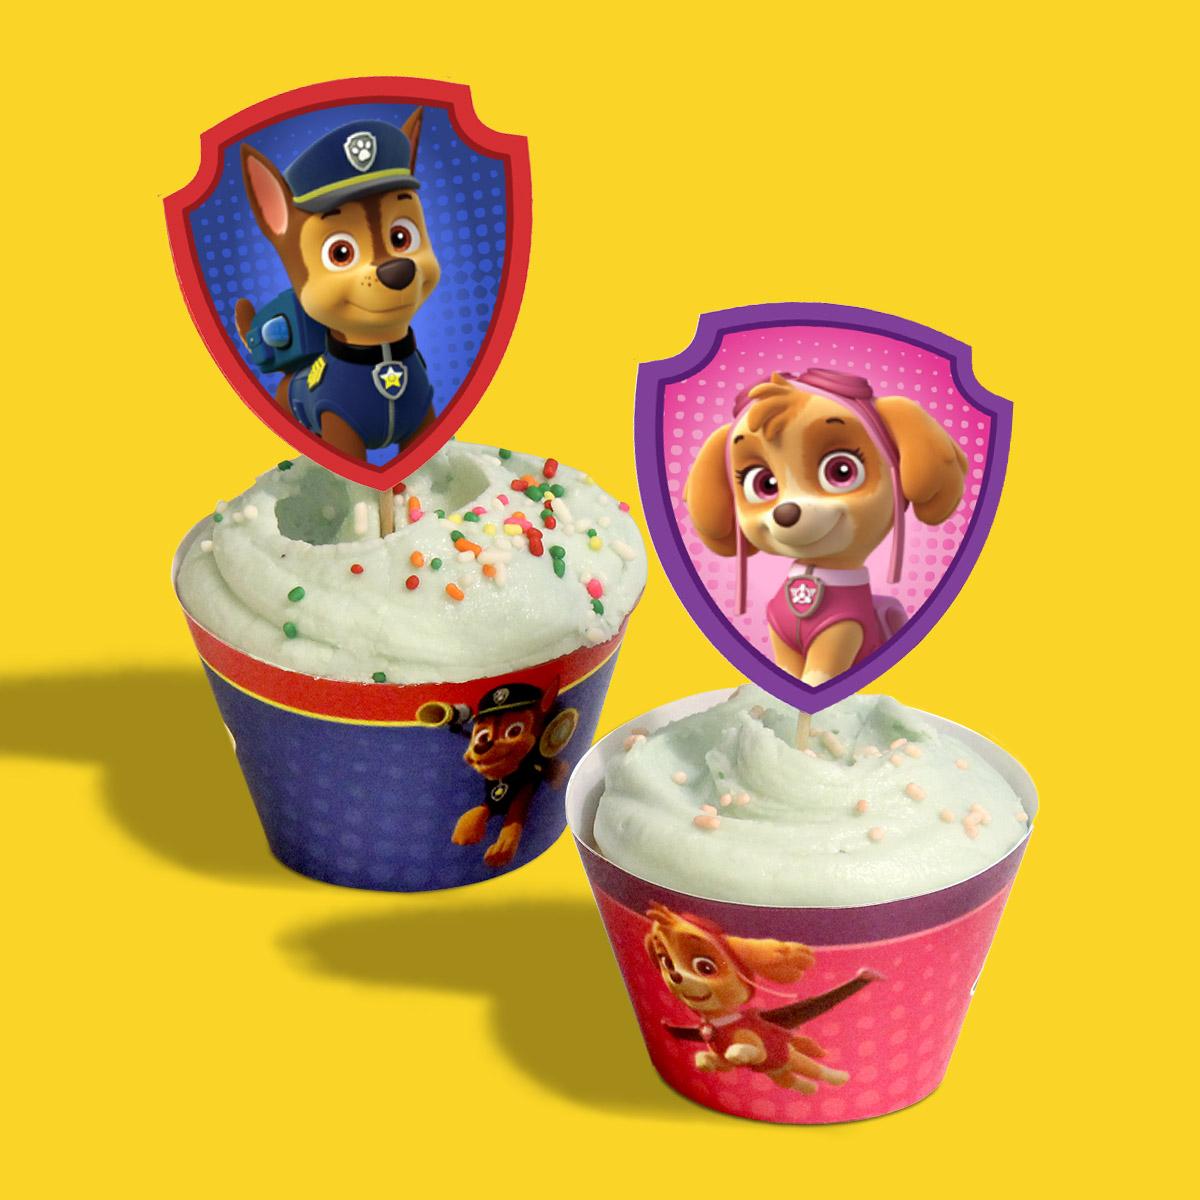 cupcakes de la Patrulla Canina